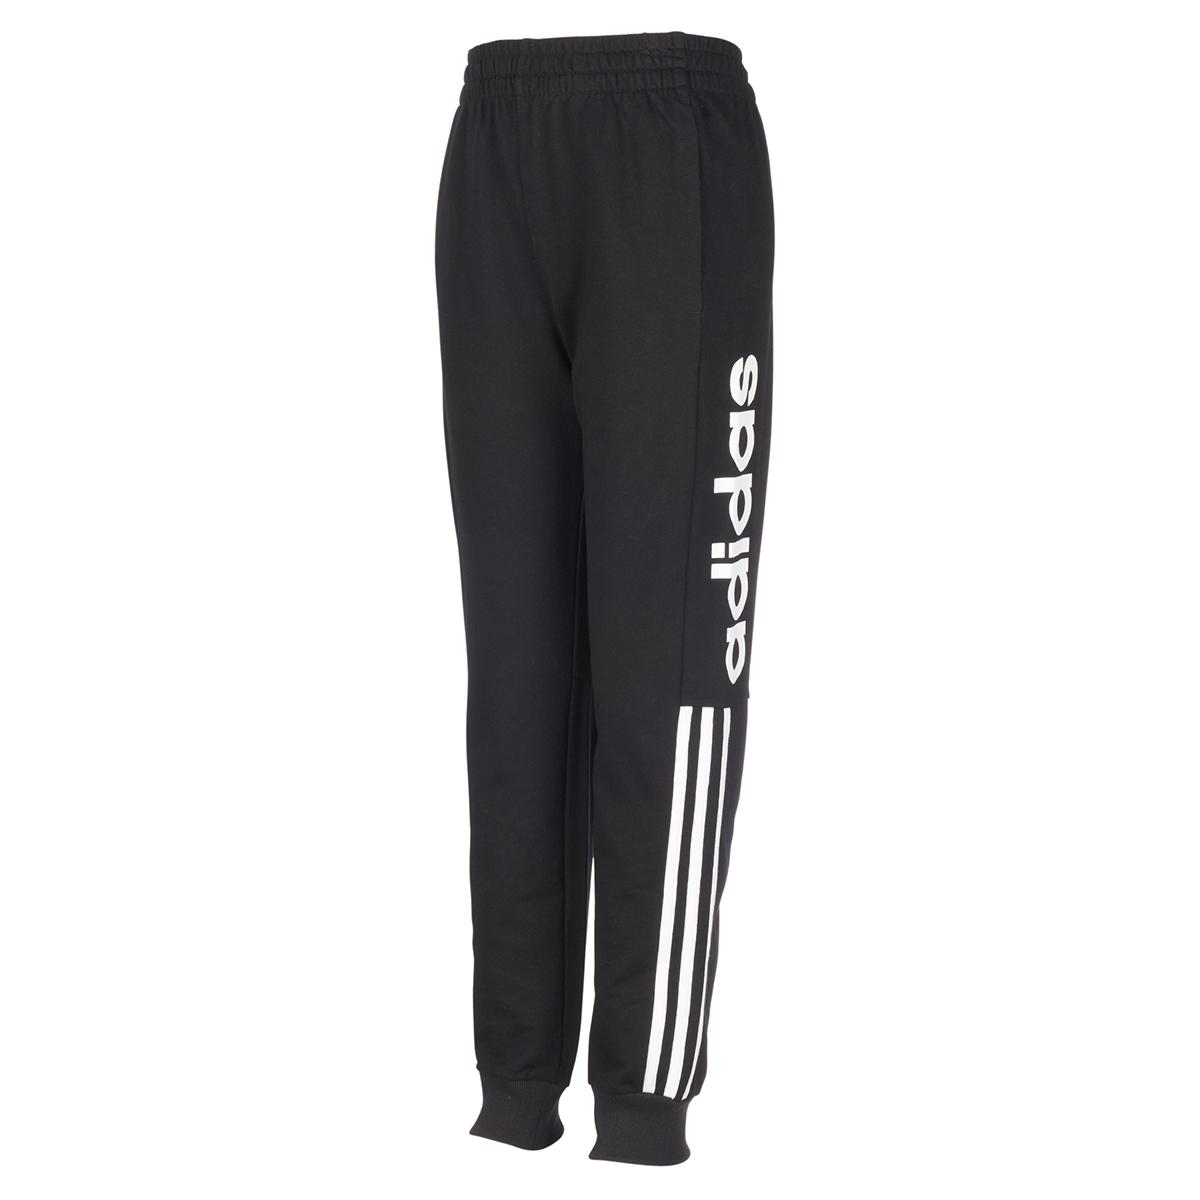 Adidas Boys' Core Linear Jogger Pants - Black, XL